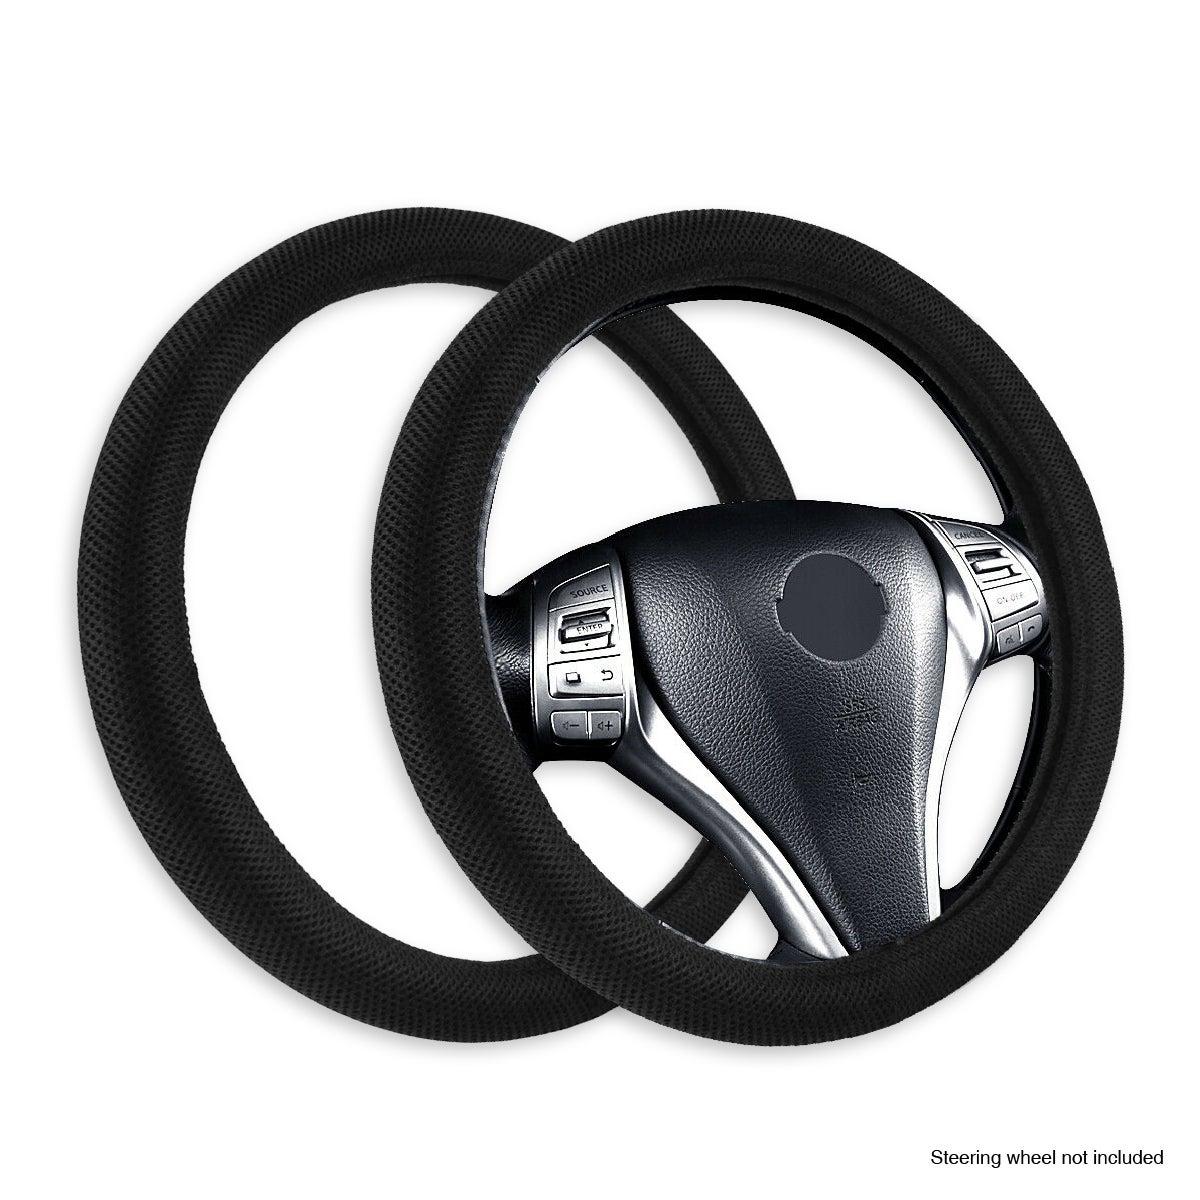 Handy Automotive® 2PK Steering Wheel Cover Mesh Design Universal Fit Anti Slip